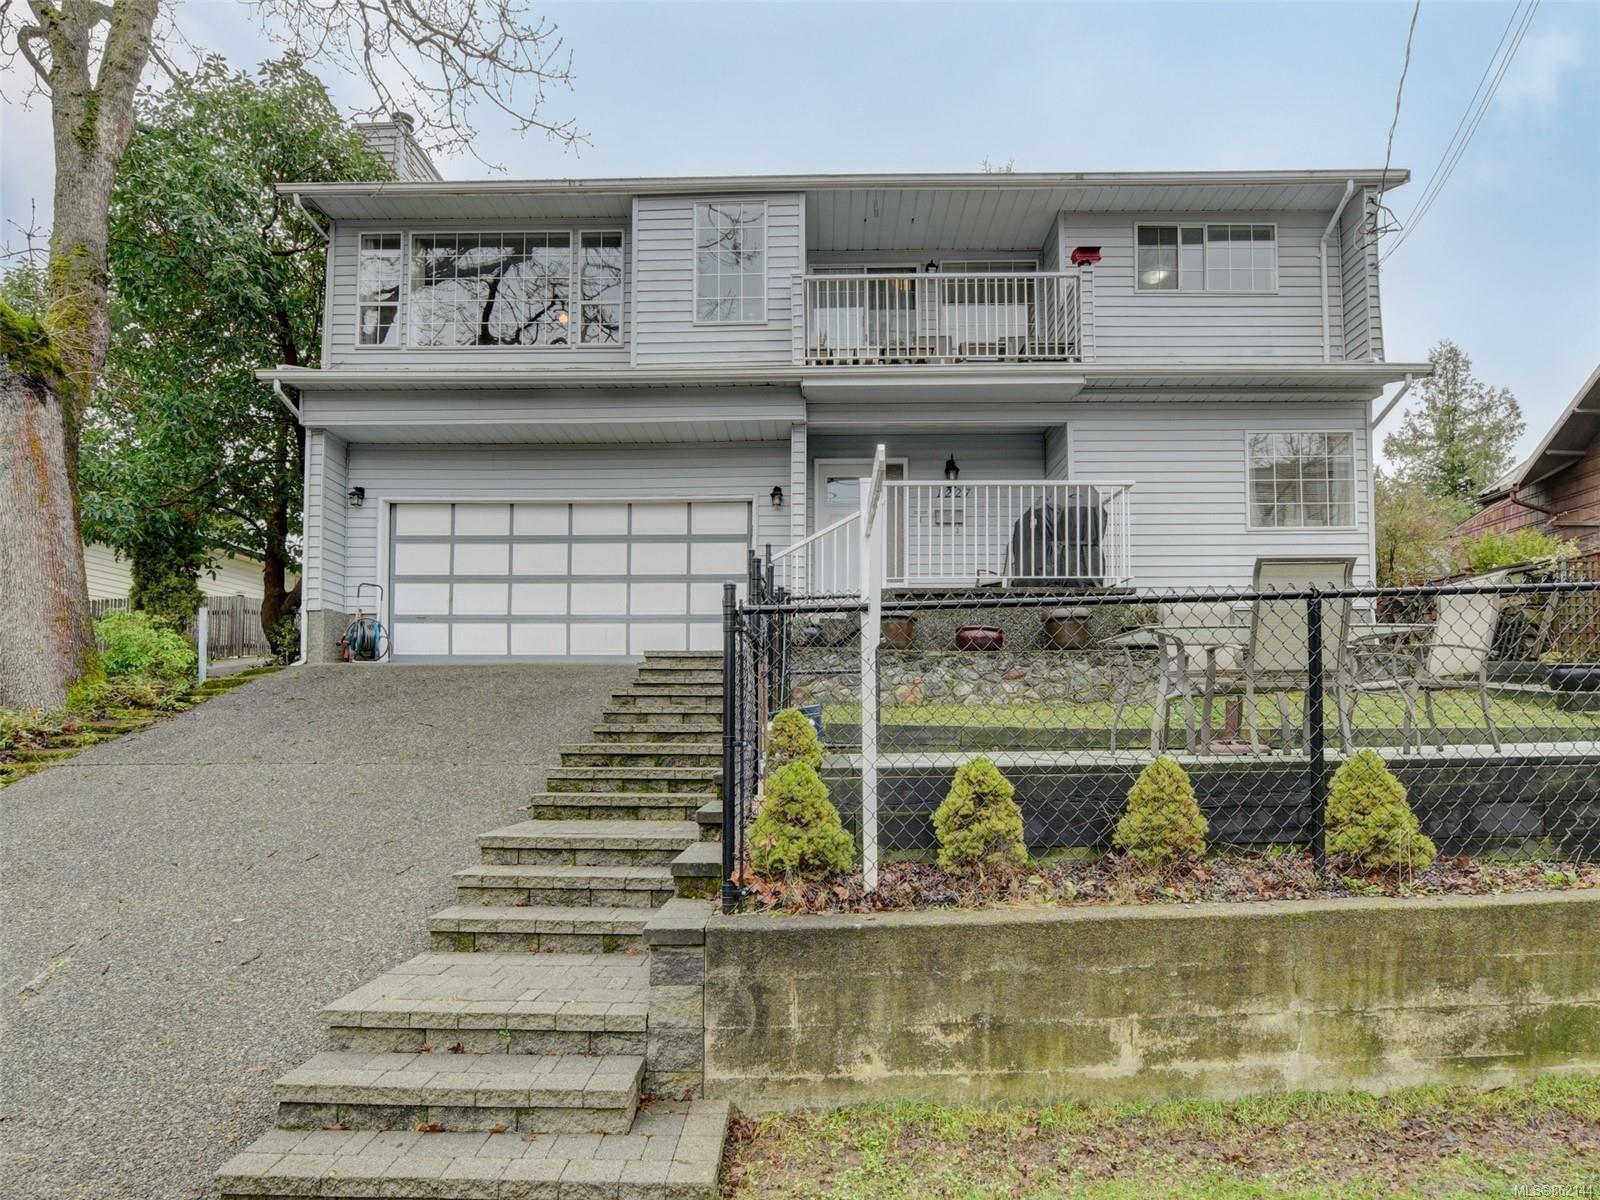 Main Photo: 1227 Carlisle Ave in : Es Saxe Point Half Duplex for sale (Esquimalt)  : MLS®# 862144